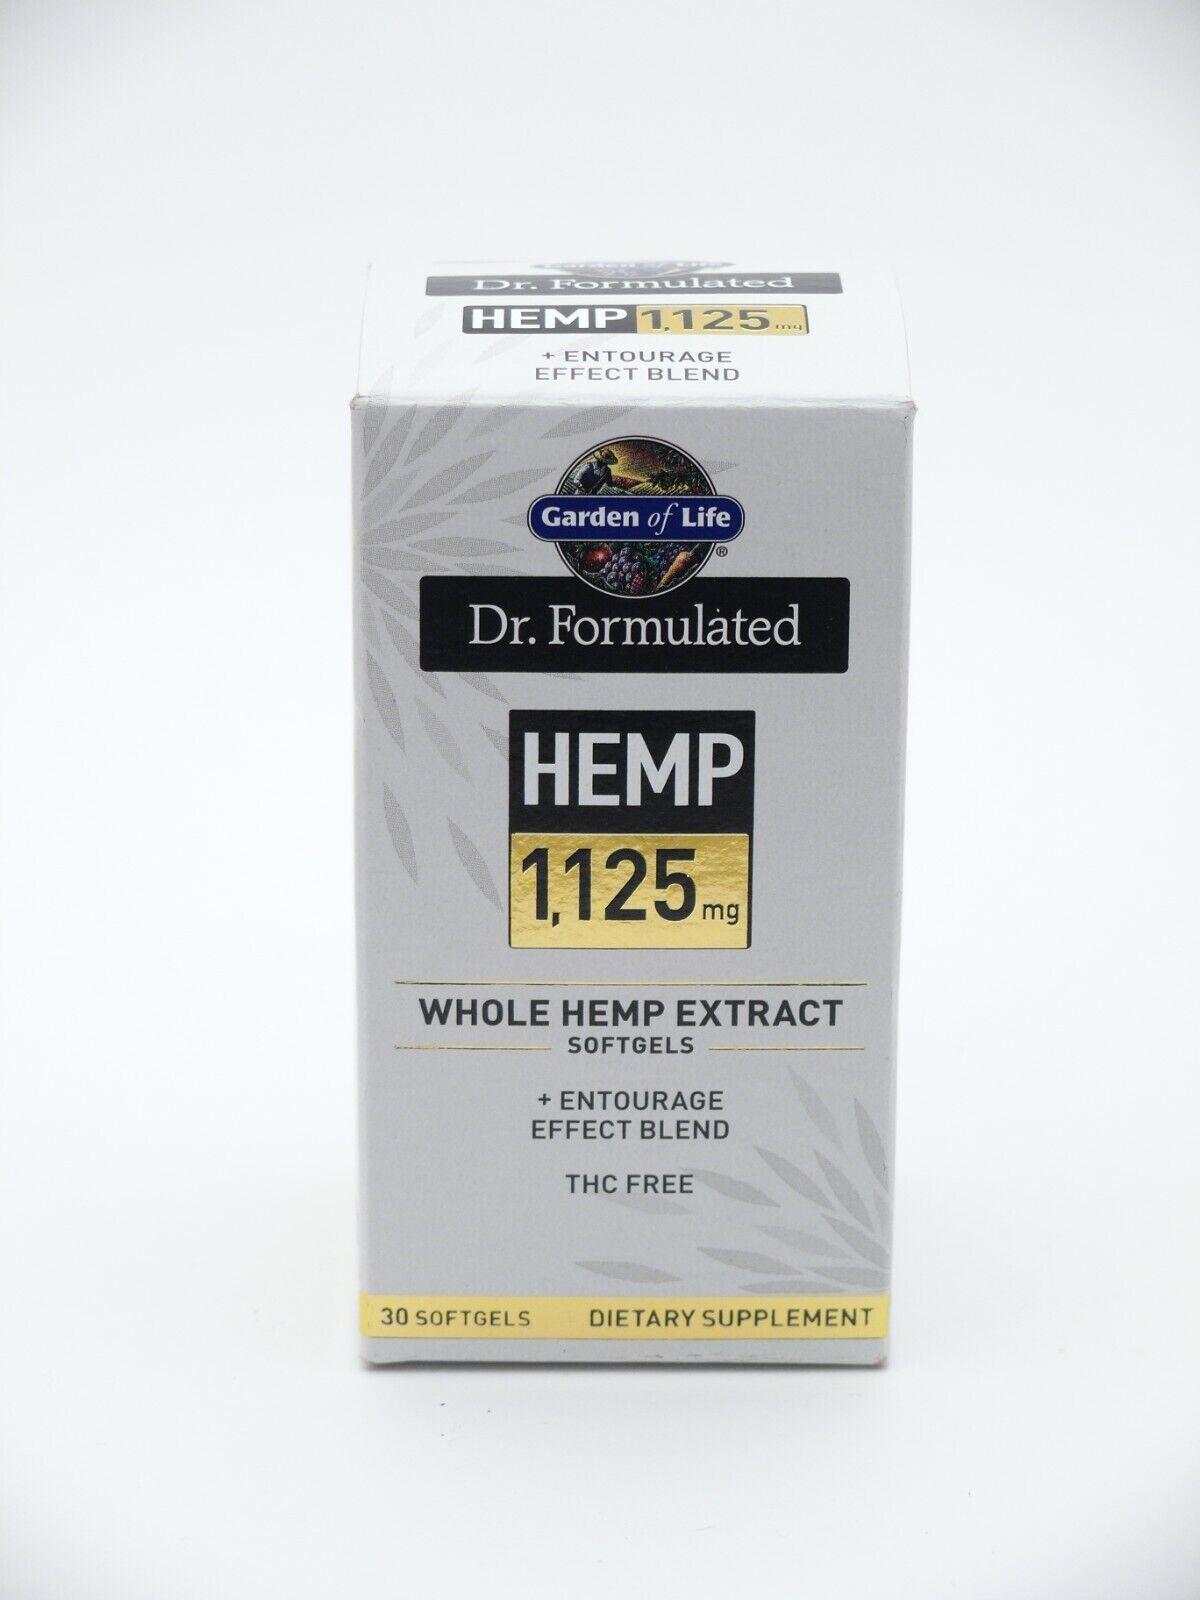 Garden Of Life Dr. Formulated Hemp 1,125mg 30 Softgels NEW SEALED (exp 03/2021)